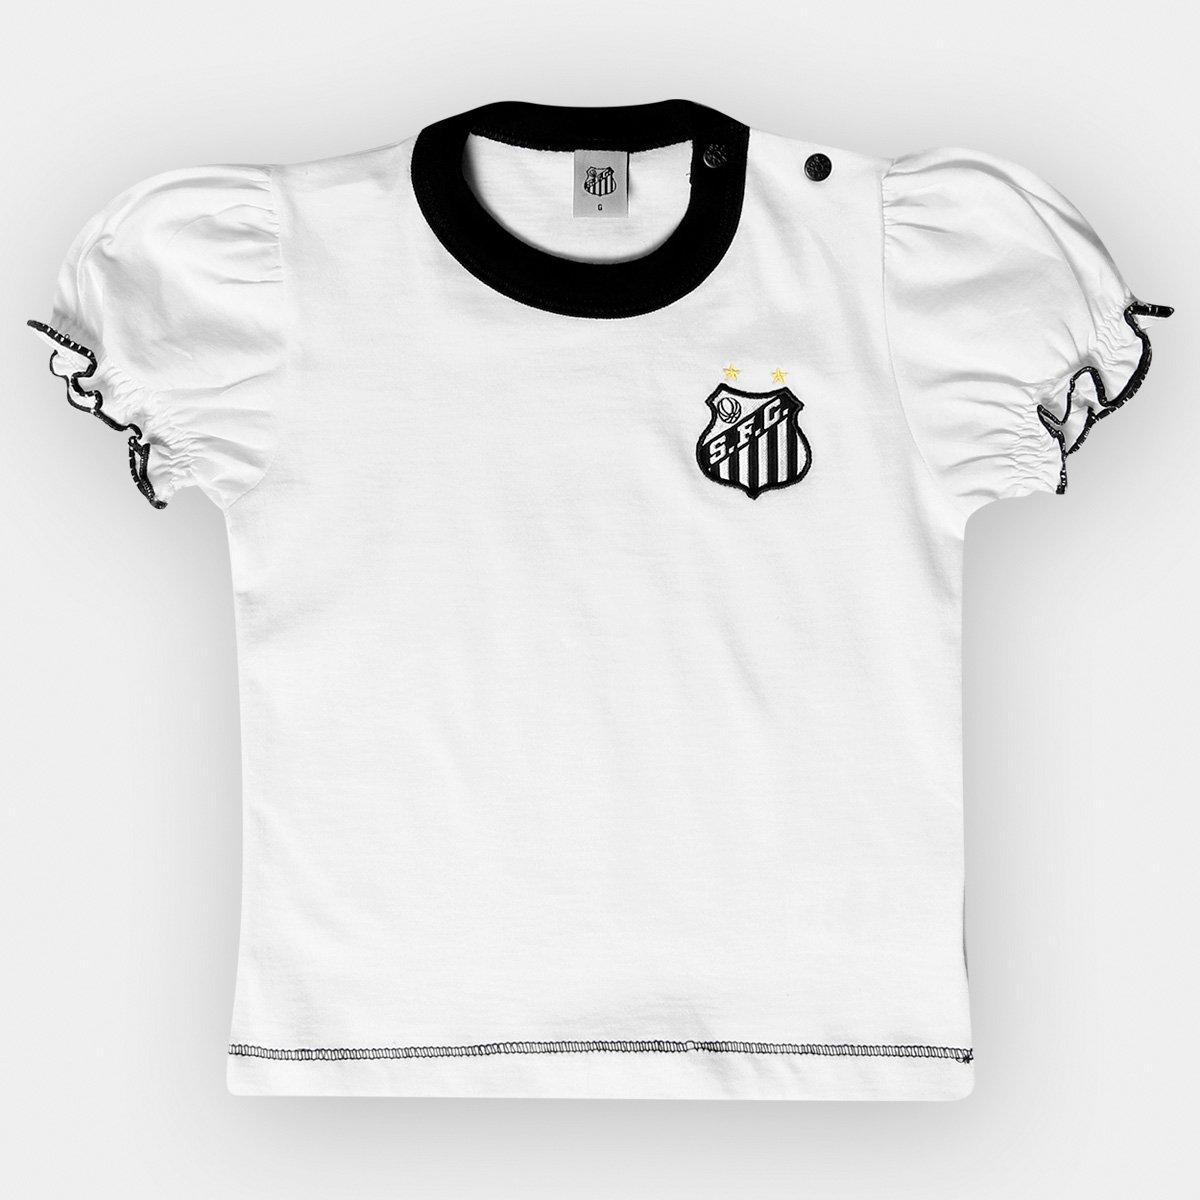 ea3844fcff85f Camiseta Santos Infantil Baby Look Cores Clube - Branco e Preto - Compre  Agora